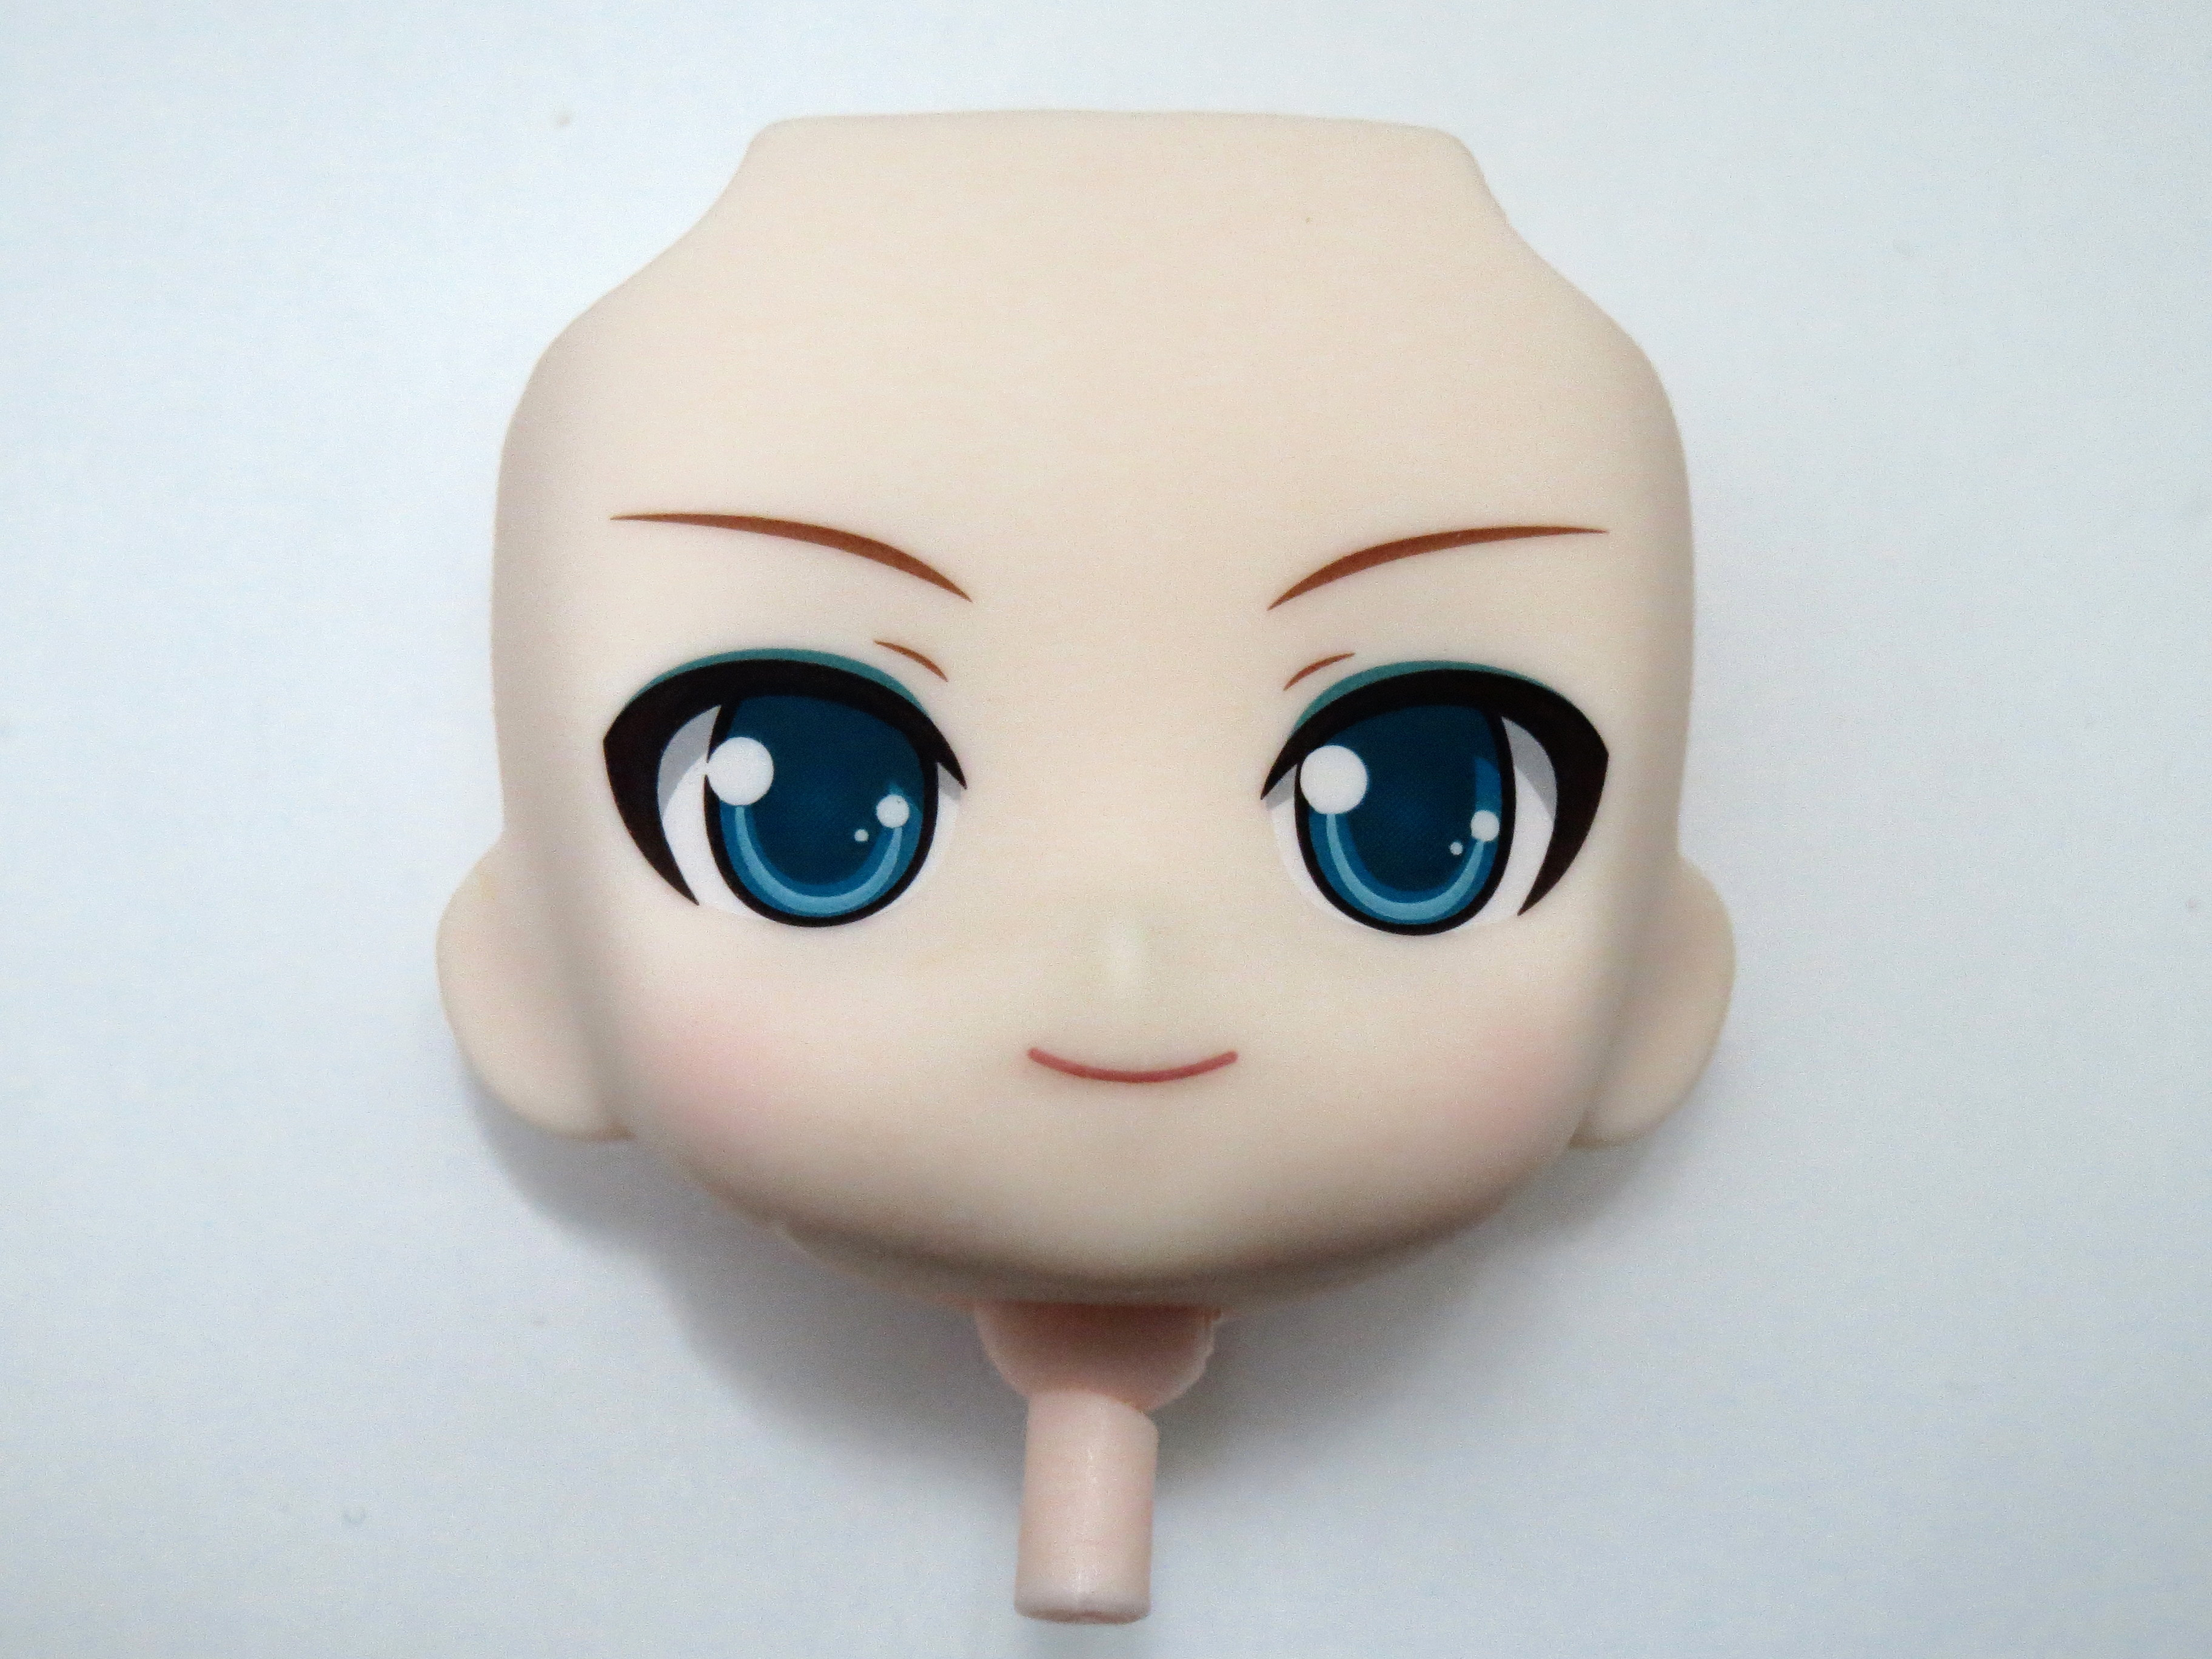 【SALE】【286】 Lily from anim.o.v.e 顔パーツ 普通 ねんどろいど